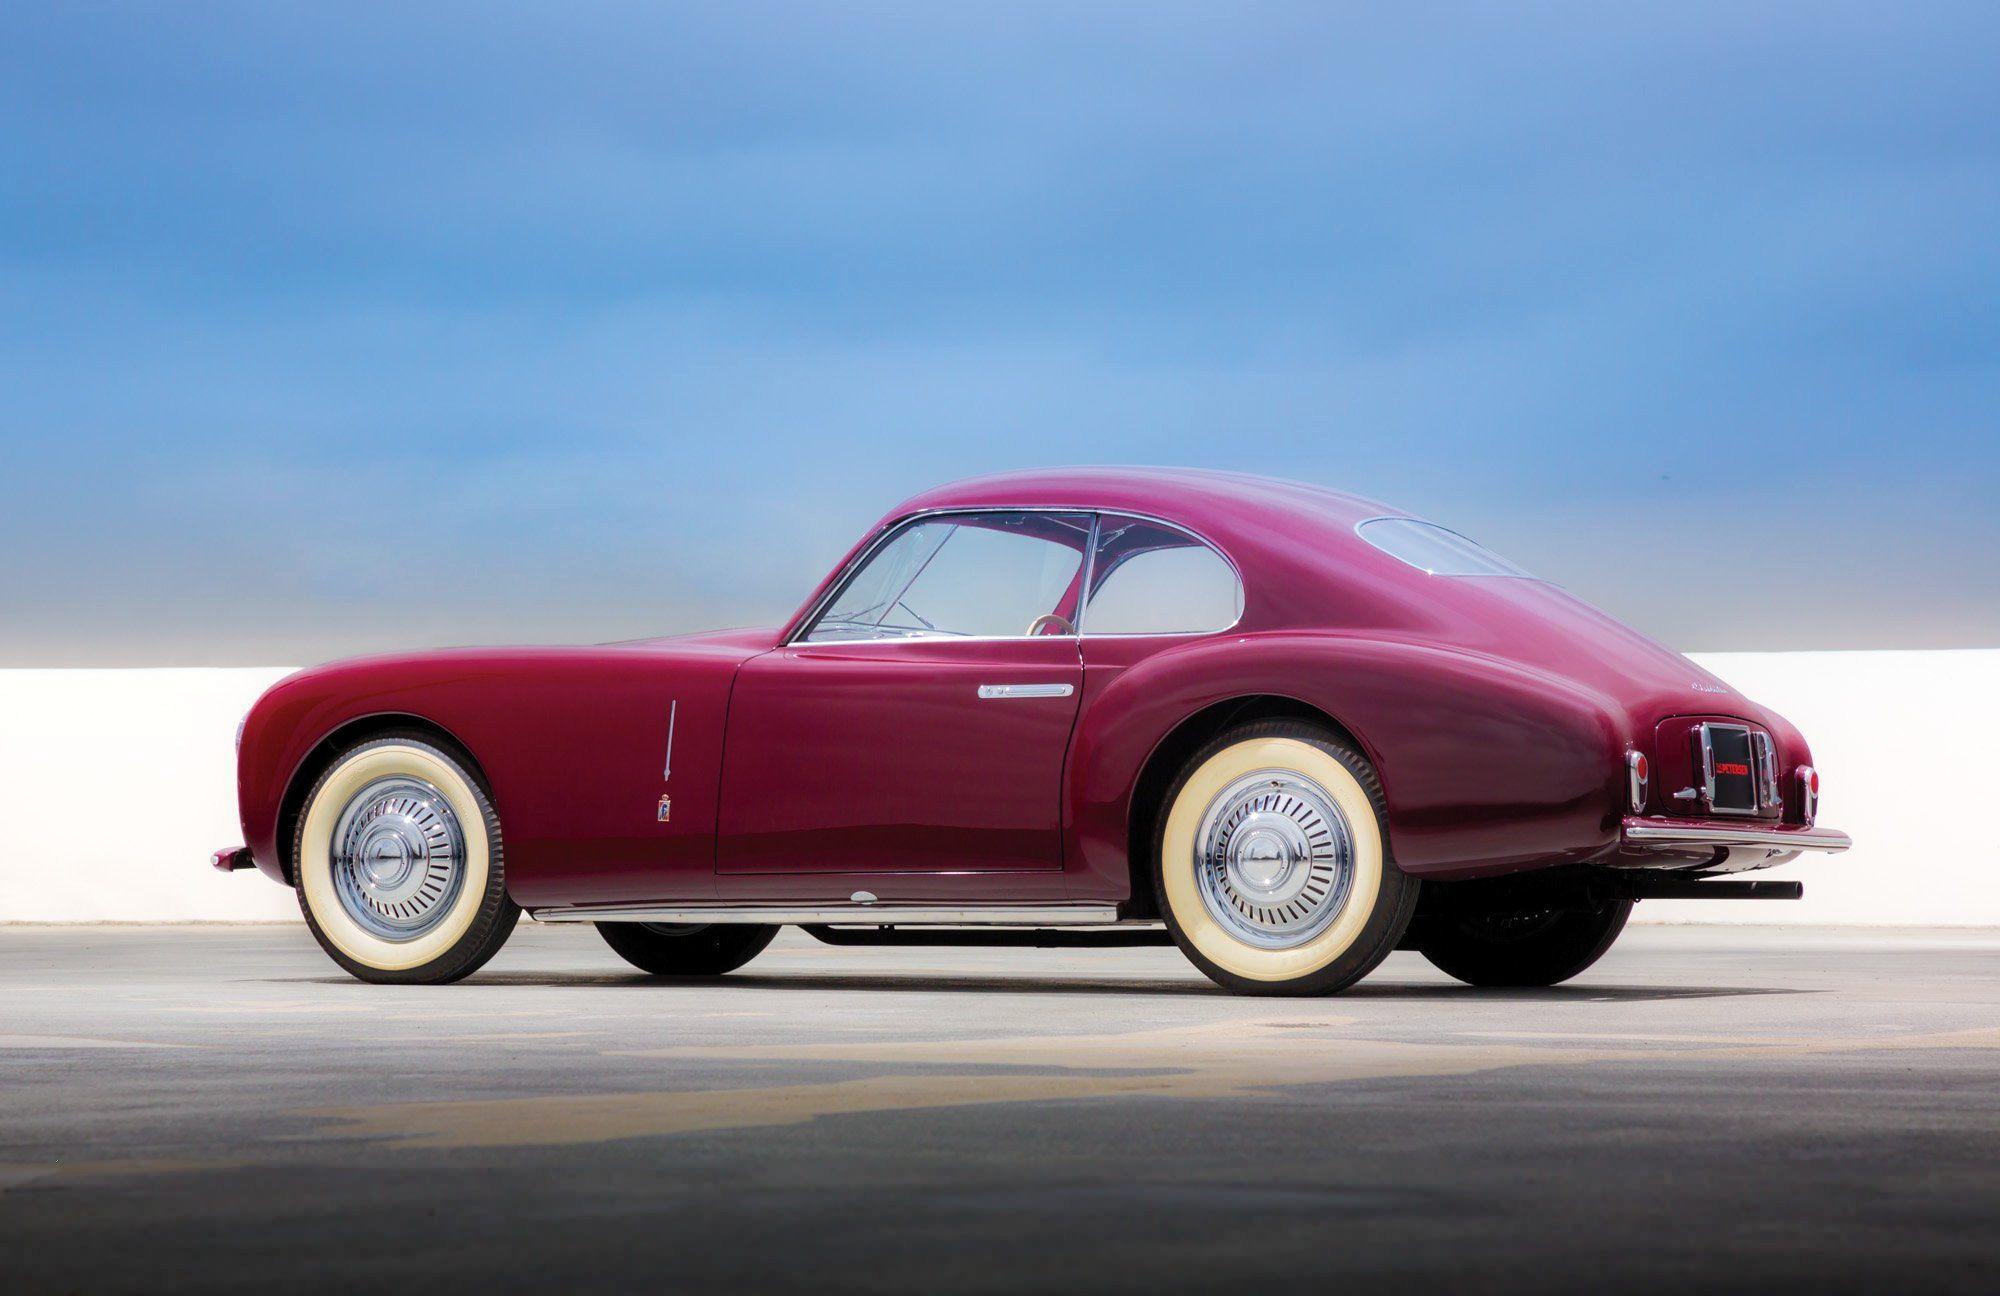 1947 Cisitalia 202 coupe Cars Pinterest